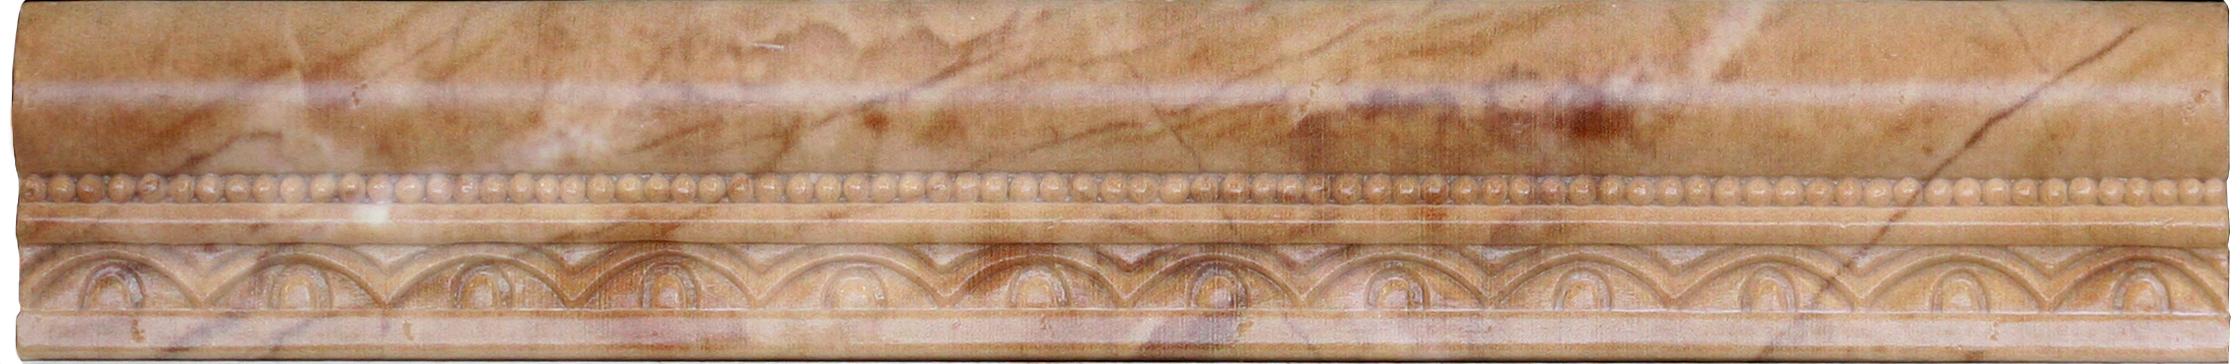 Бордюр Aparici +12886 EMILE BEIGE MOLD бордюр blau versalles mold michelle 3 5x25